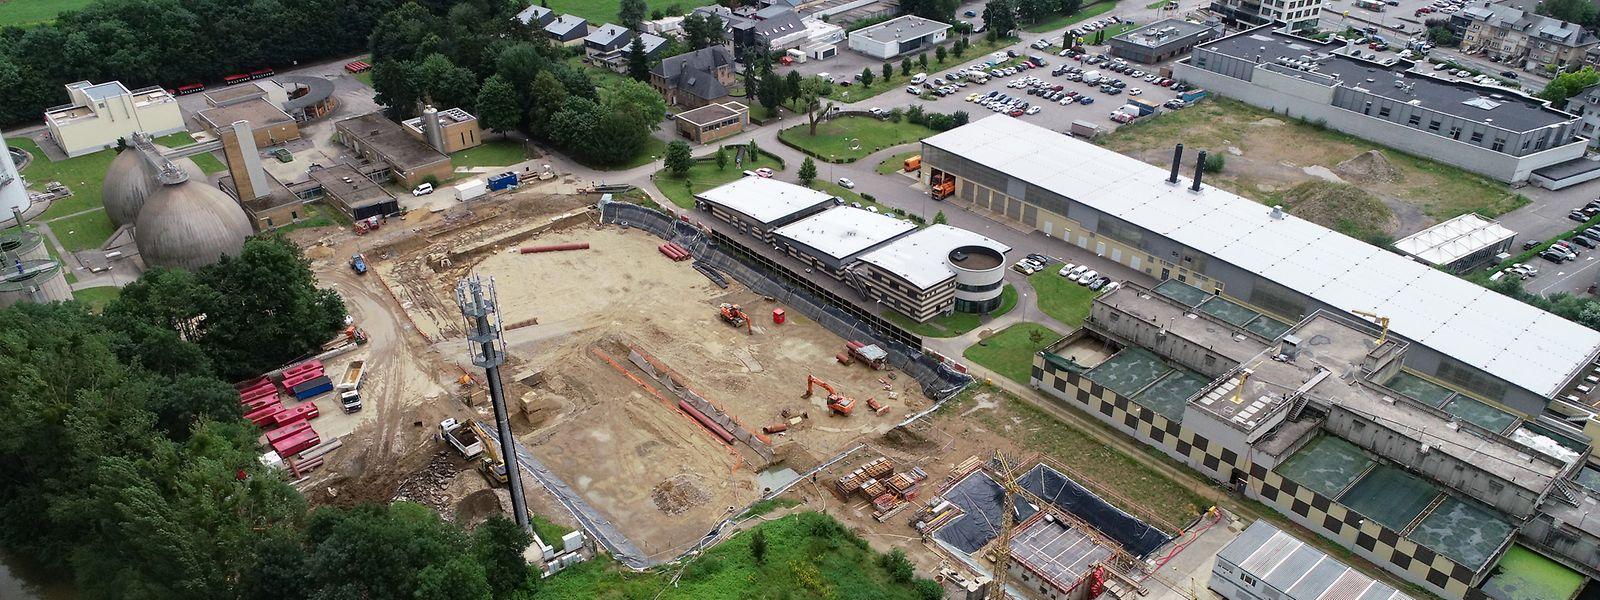 Le site de Bereldange va totalement changer d'allure d'ici 2030.